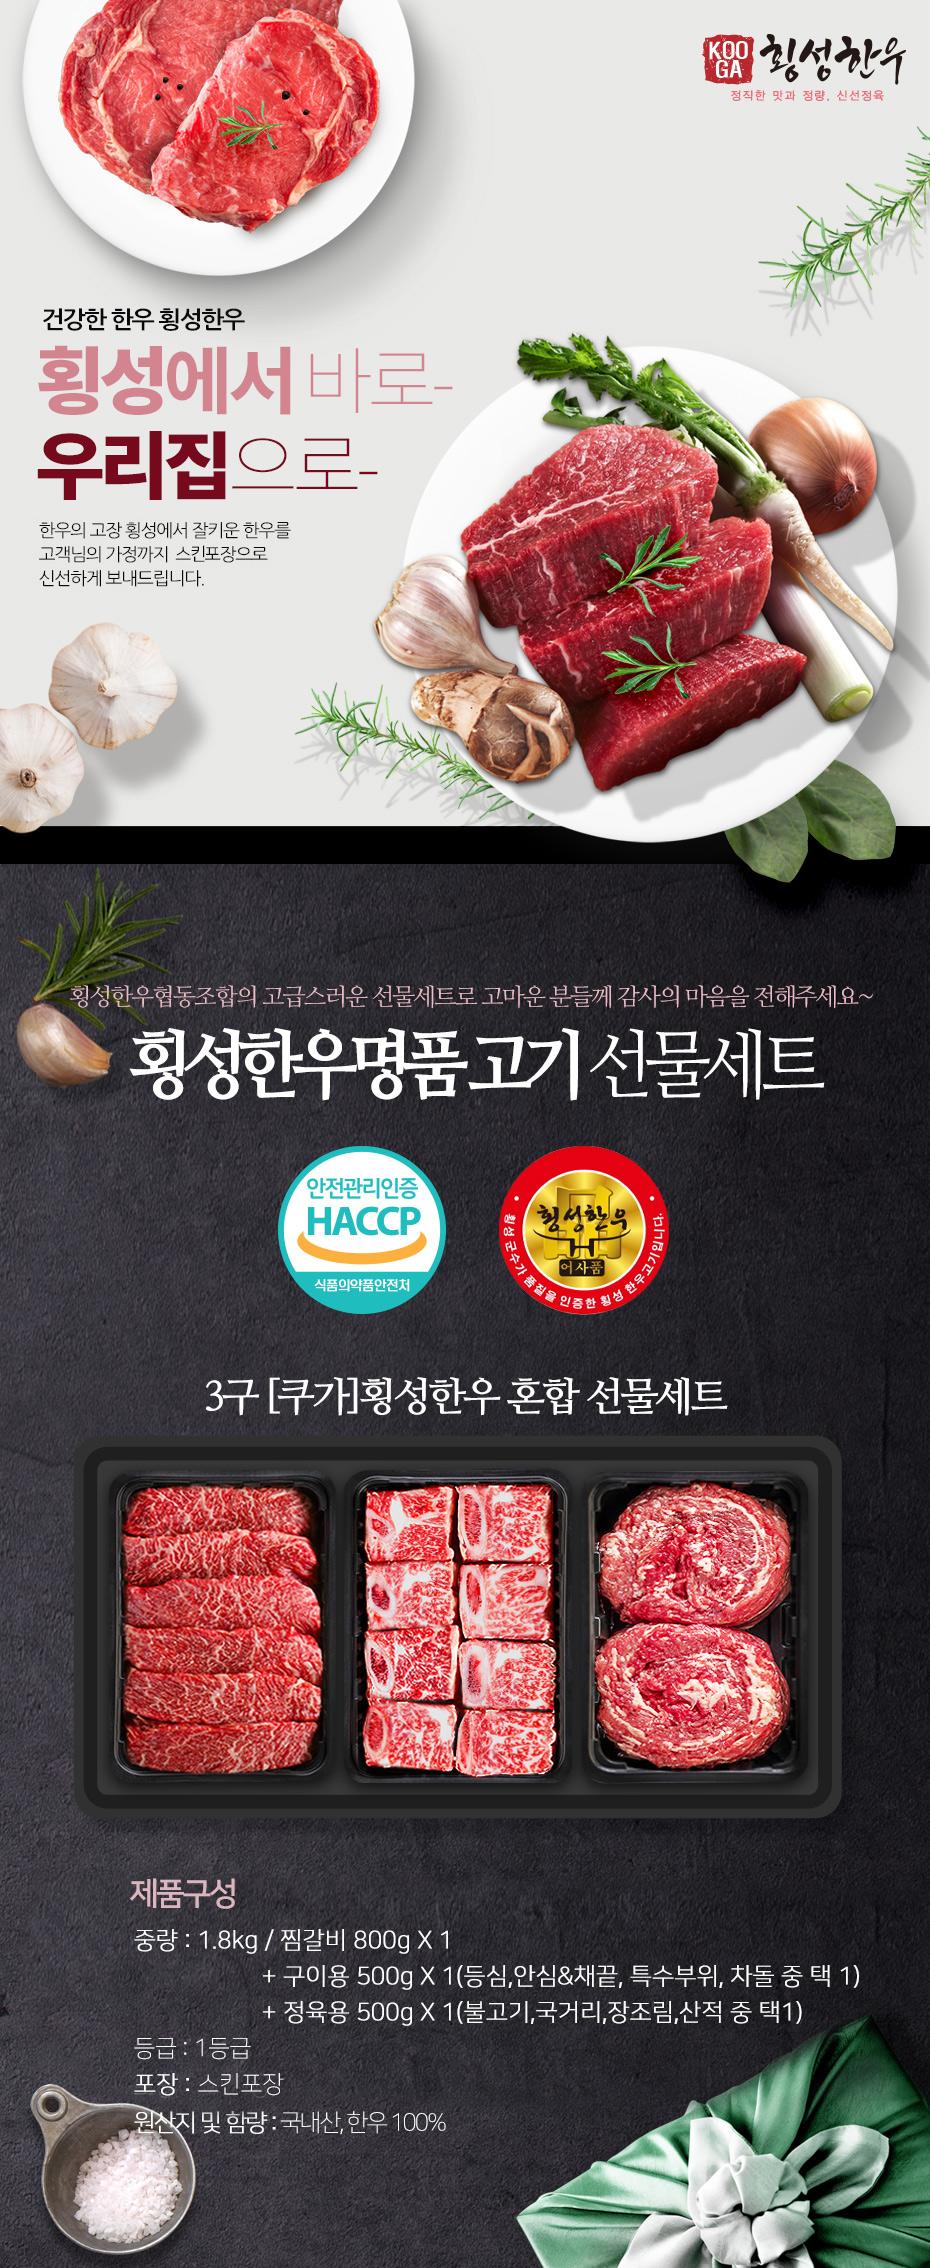 set3_meat_rib_ten_bul_024122.jpg